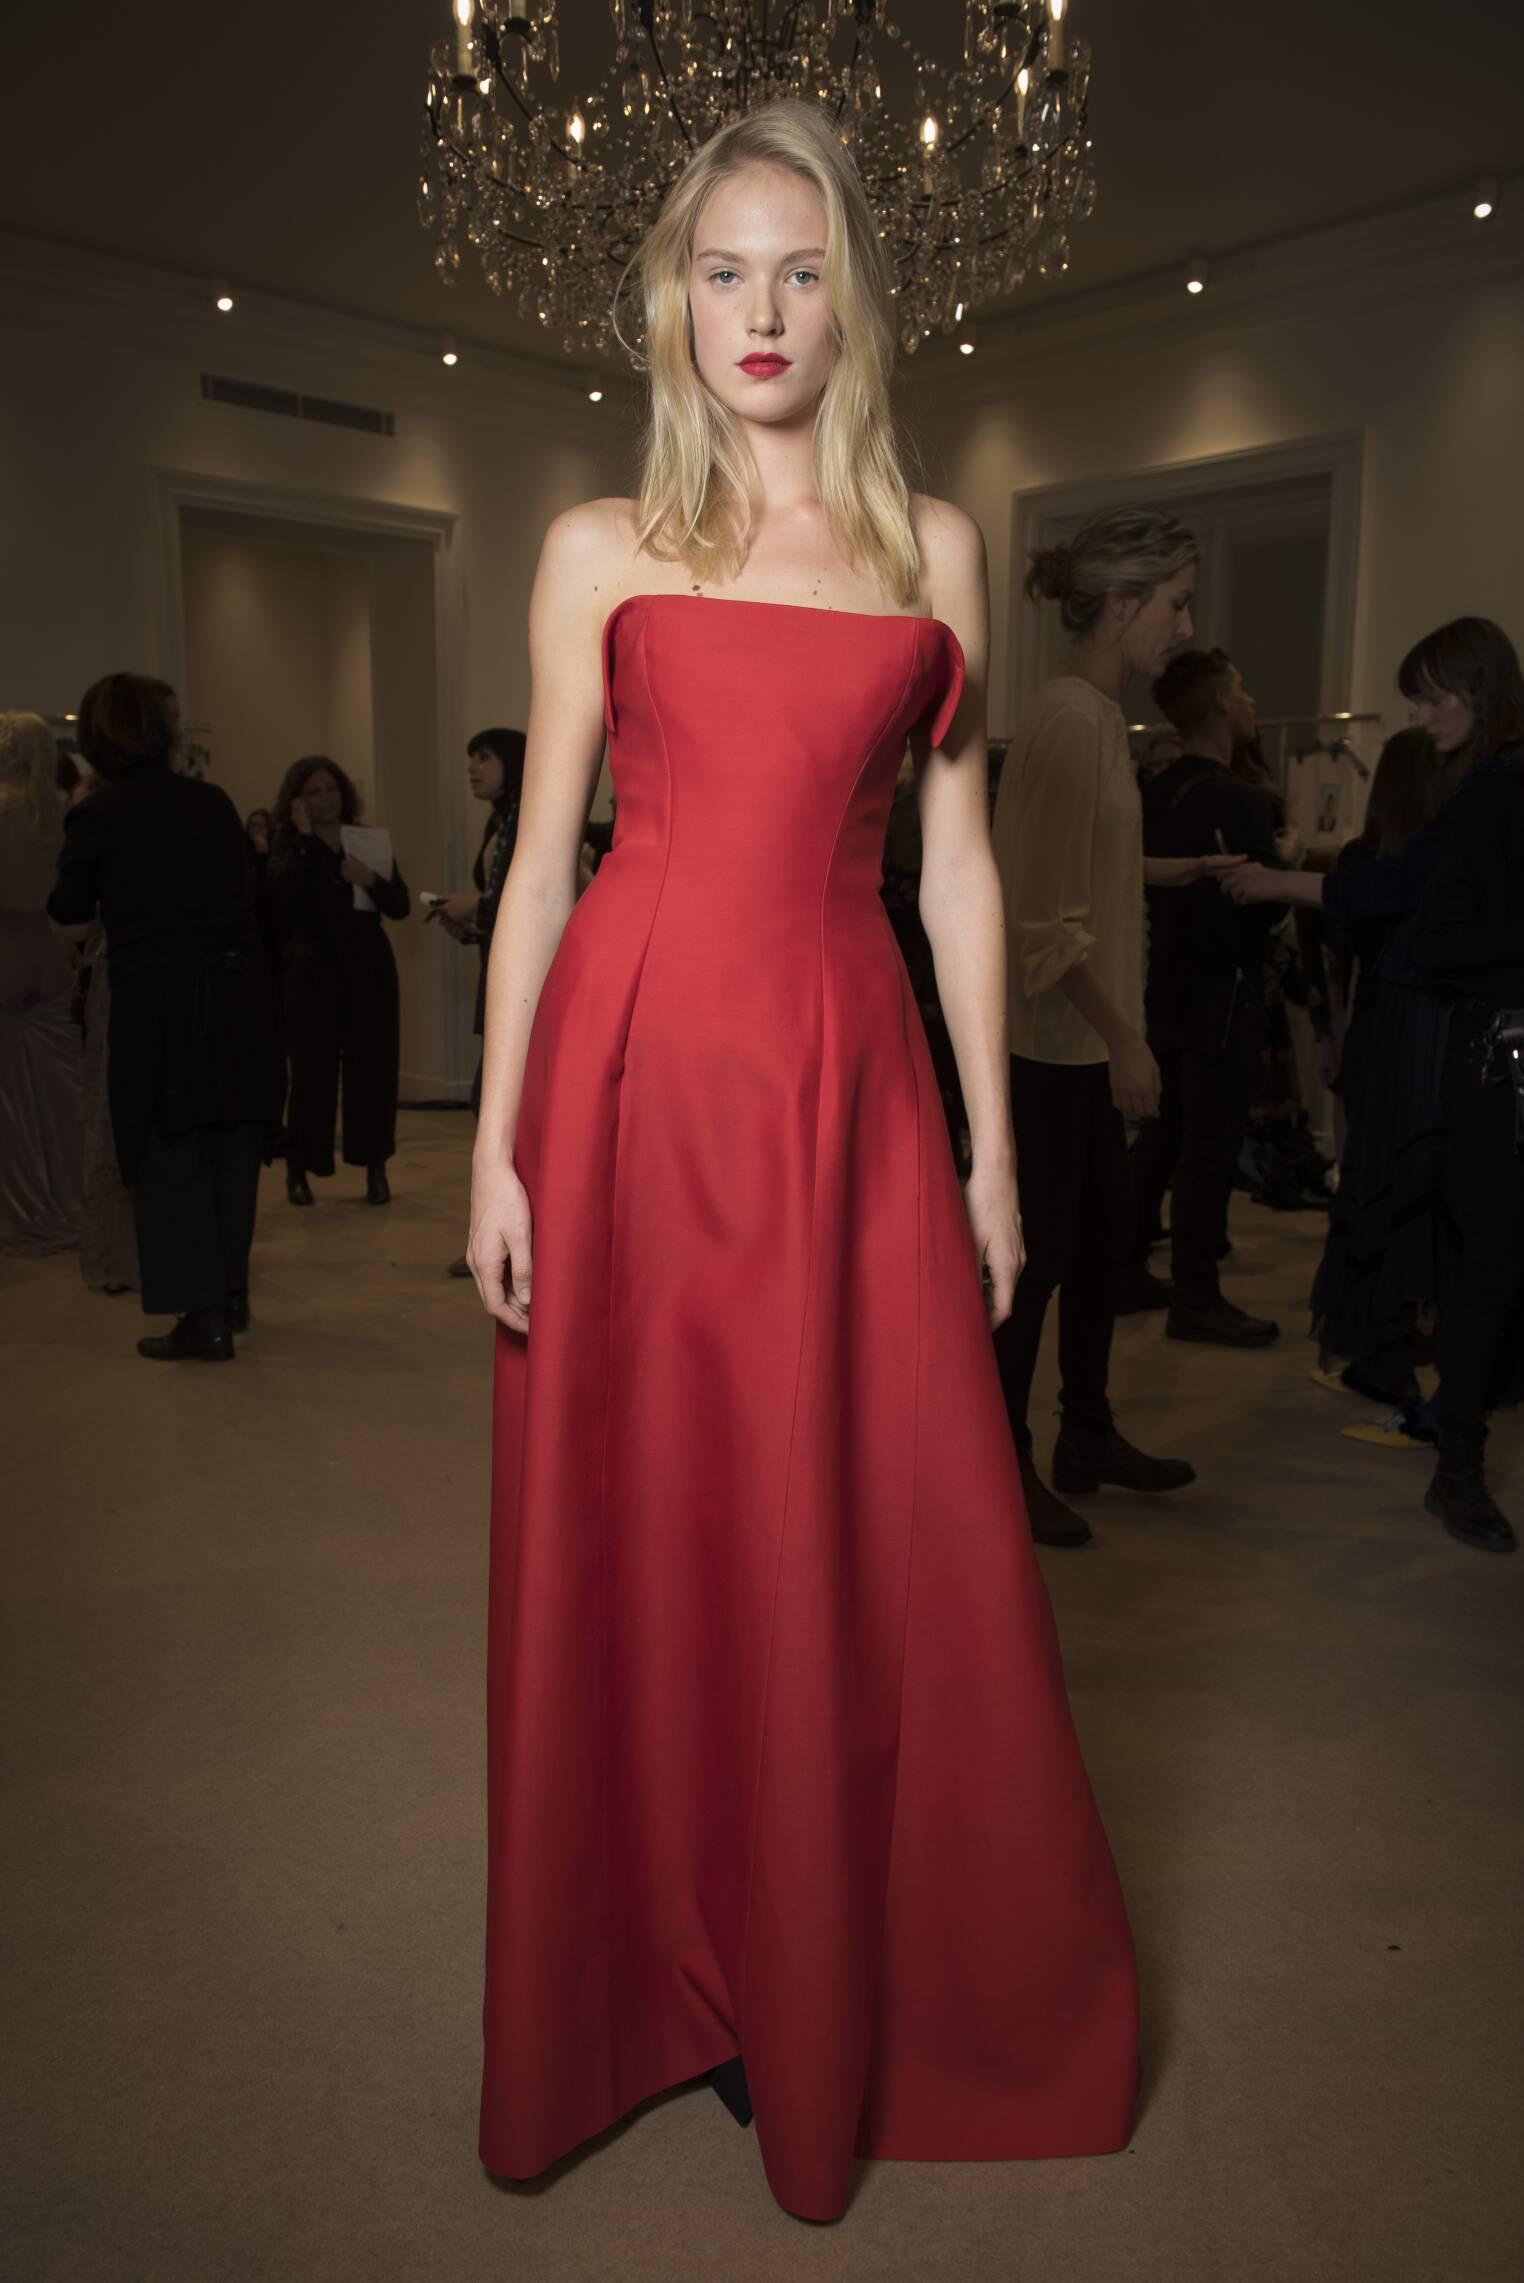 Model Backstage Alberta Ferretti Limited 2017 Women's Collection Milan Fashion Week